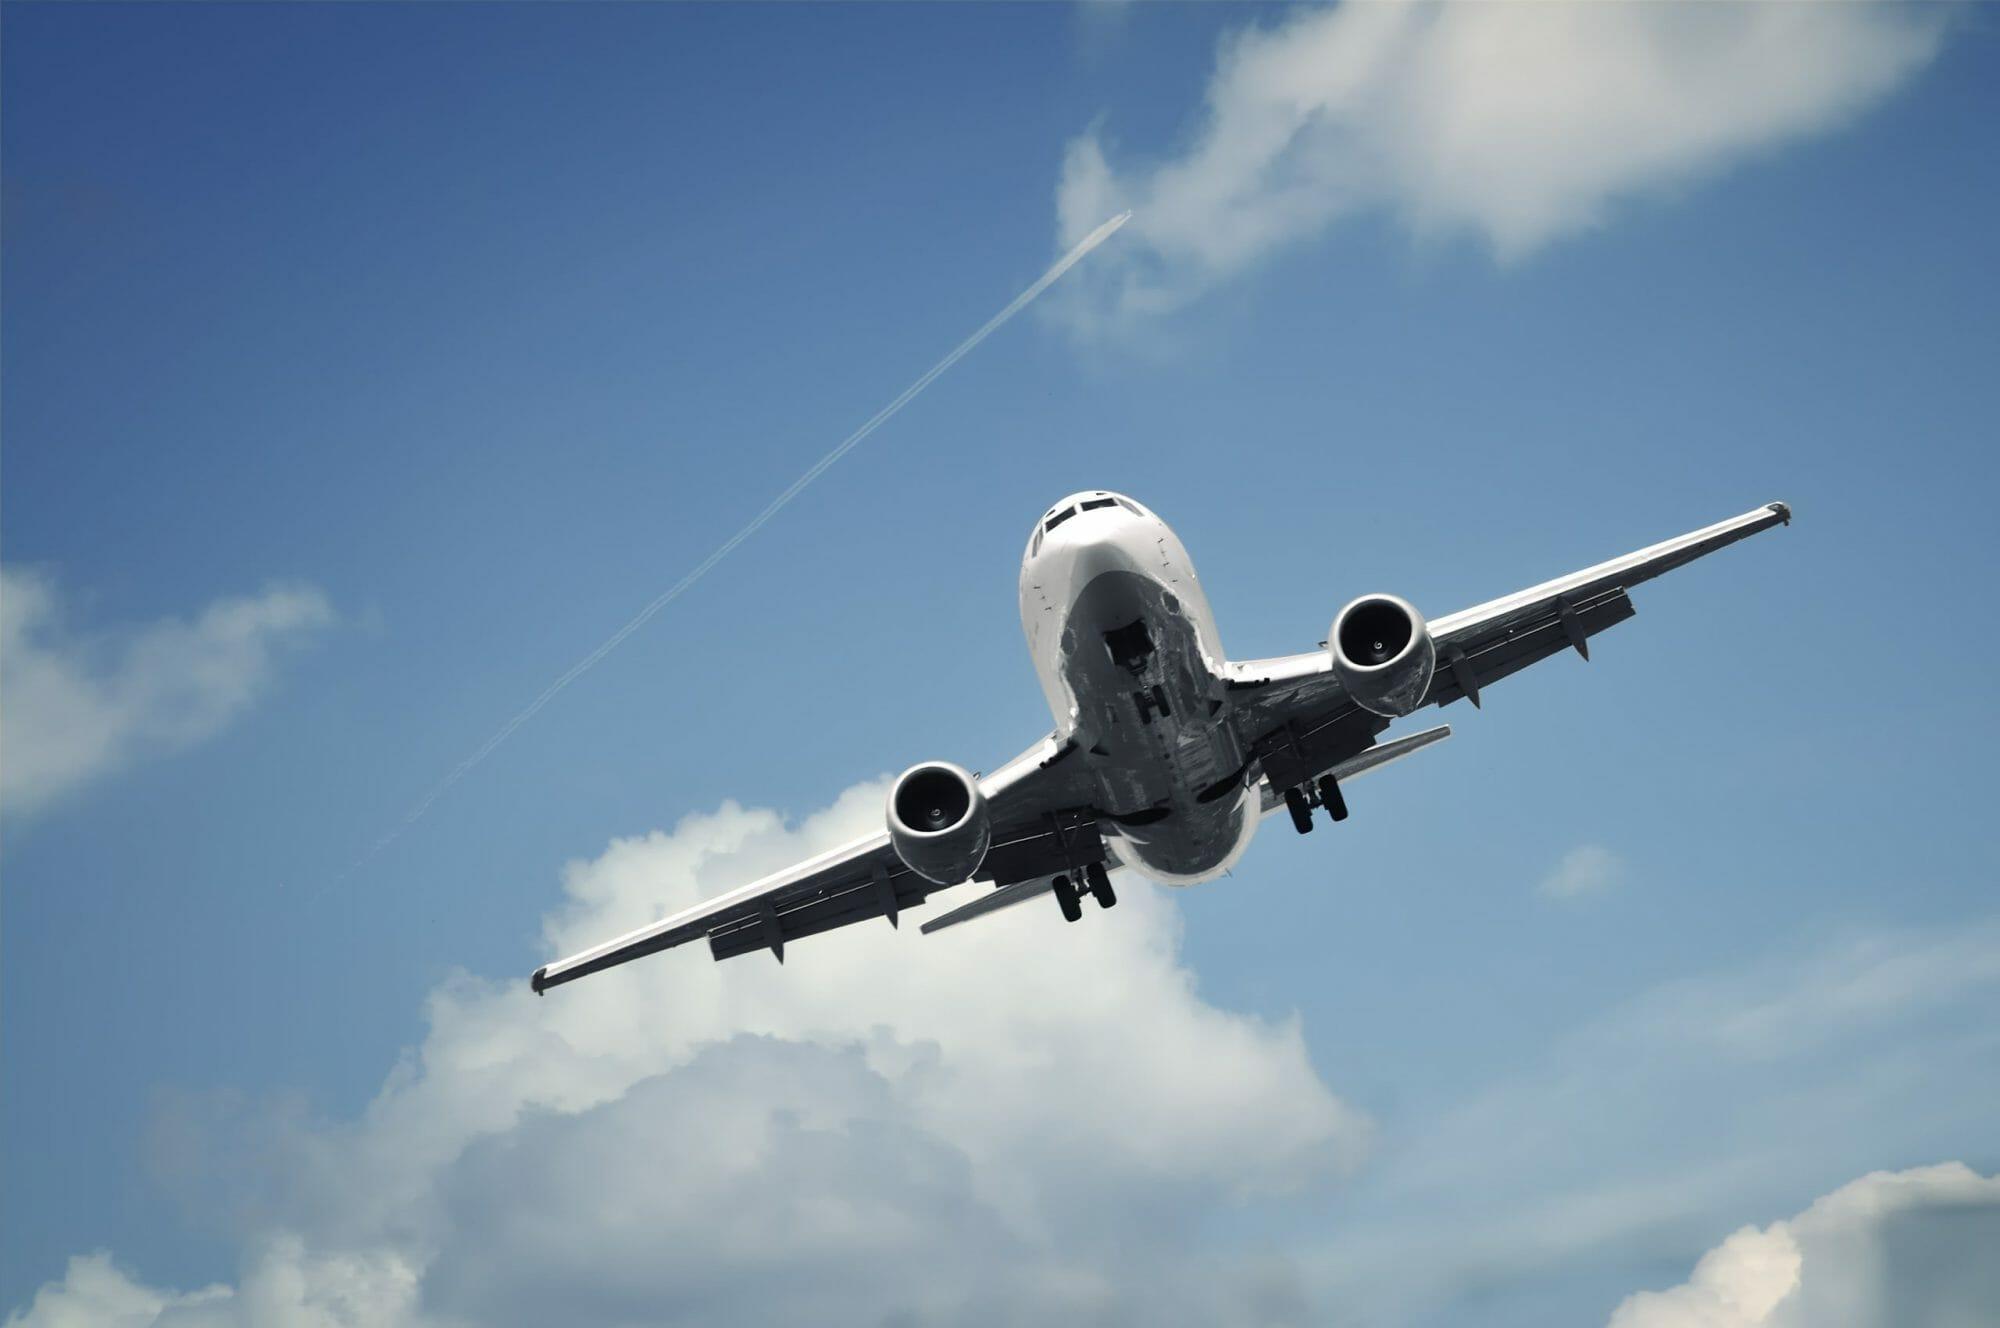 Jet-in-flight-619682-scaled